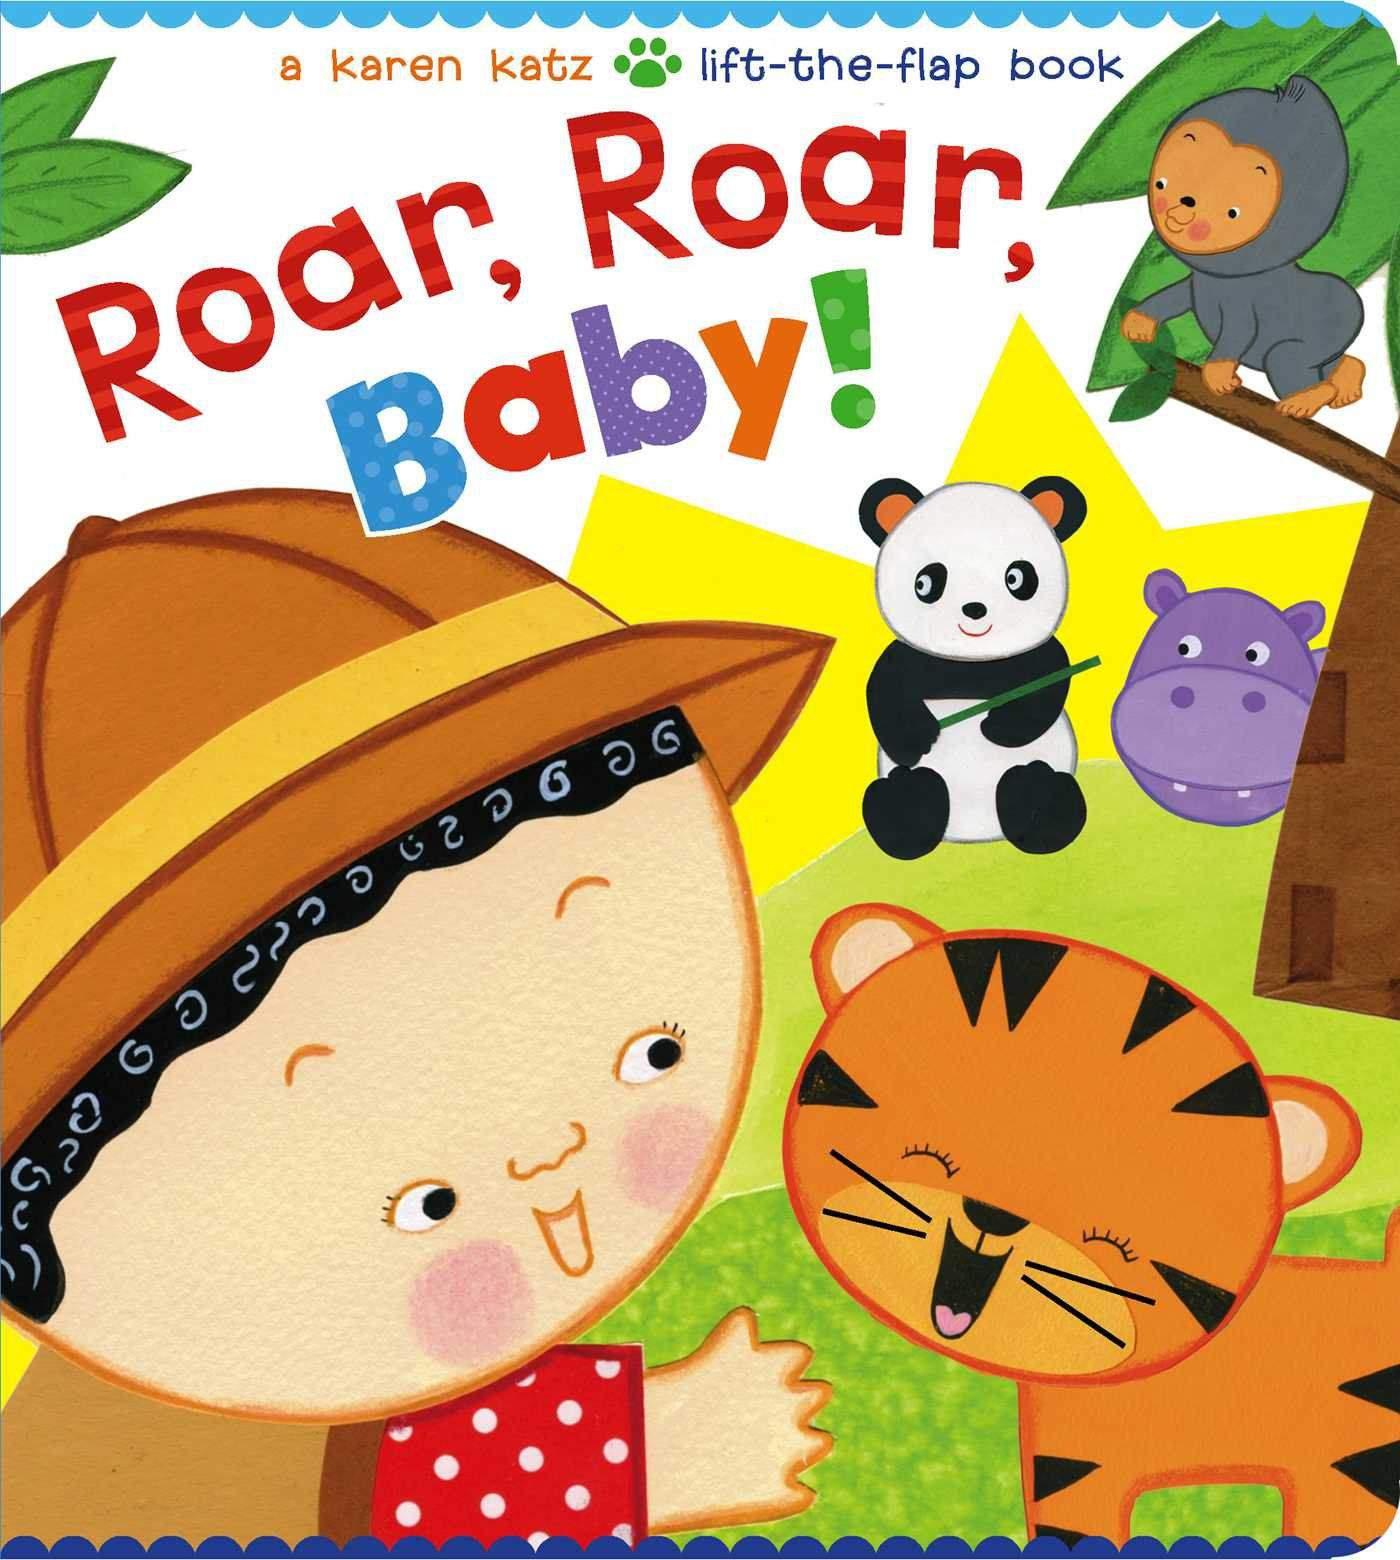 SI - Roar, Roar, Baby!: A Karen Katz Lift-the-Flap Book (Karen Katz Lift-the-Flap Books) - (Board Book)